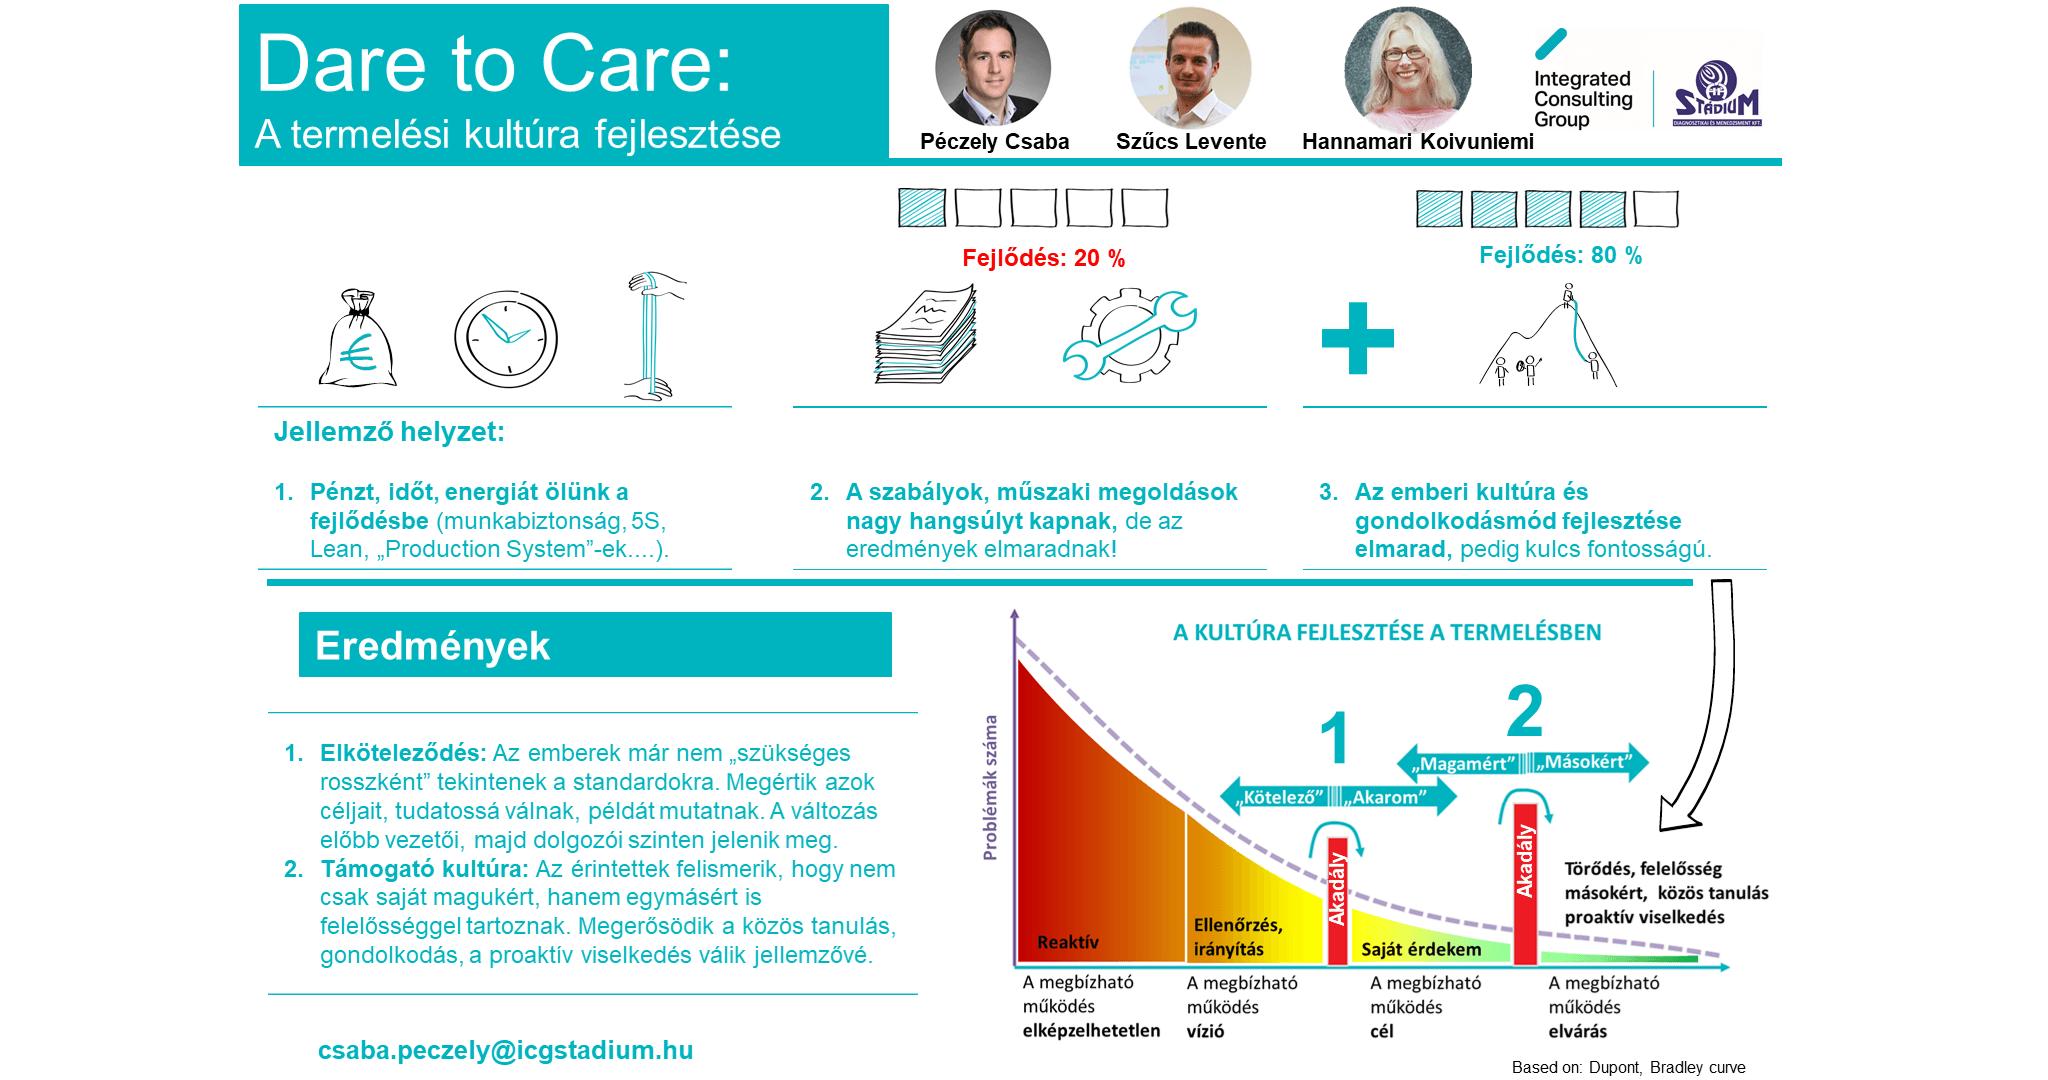 Dare to Care - A termelési kultúra fejlesztése